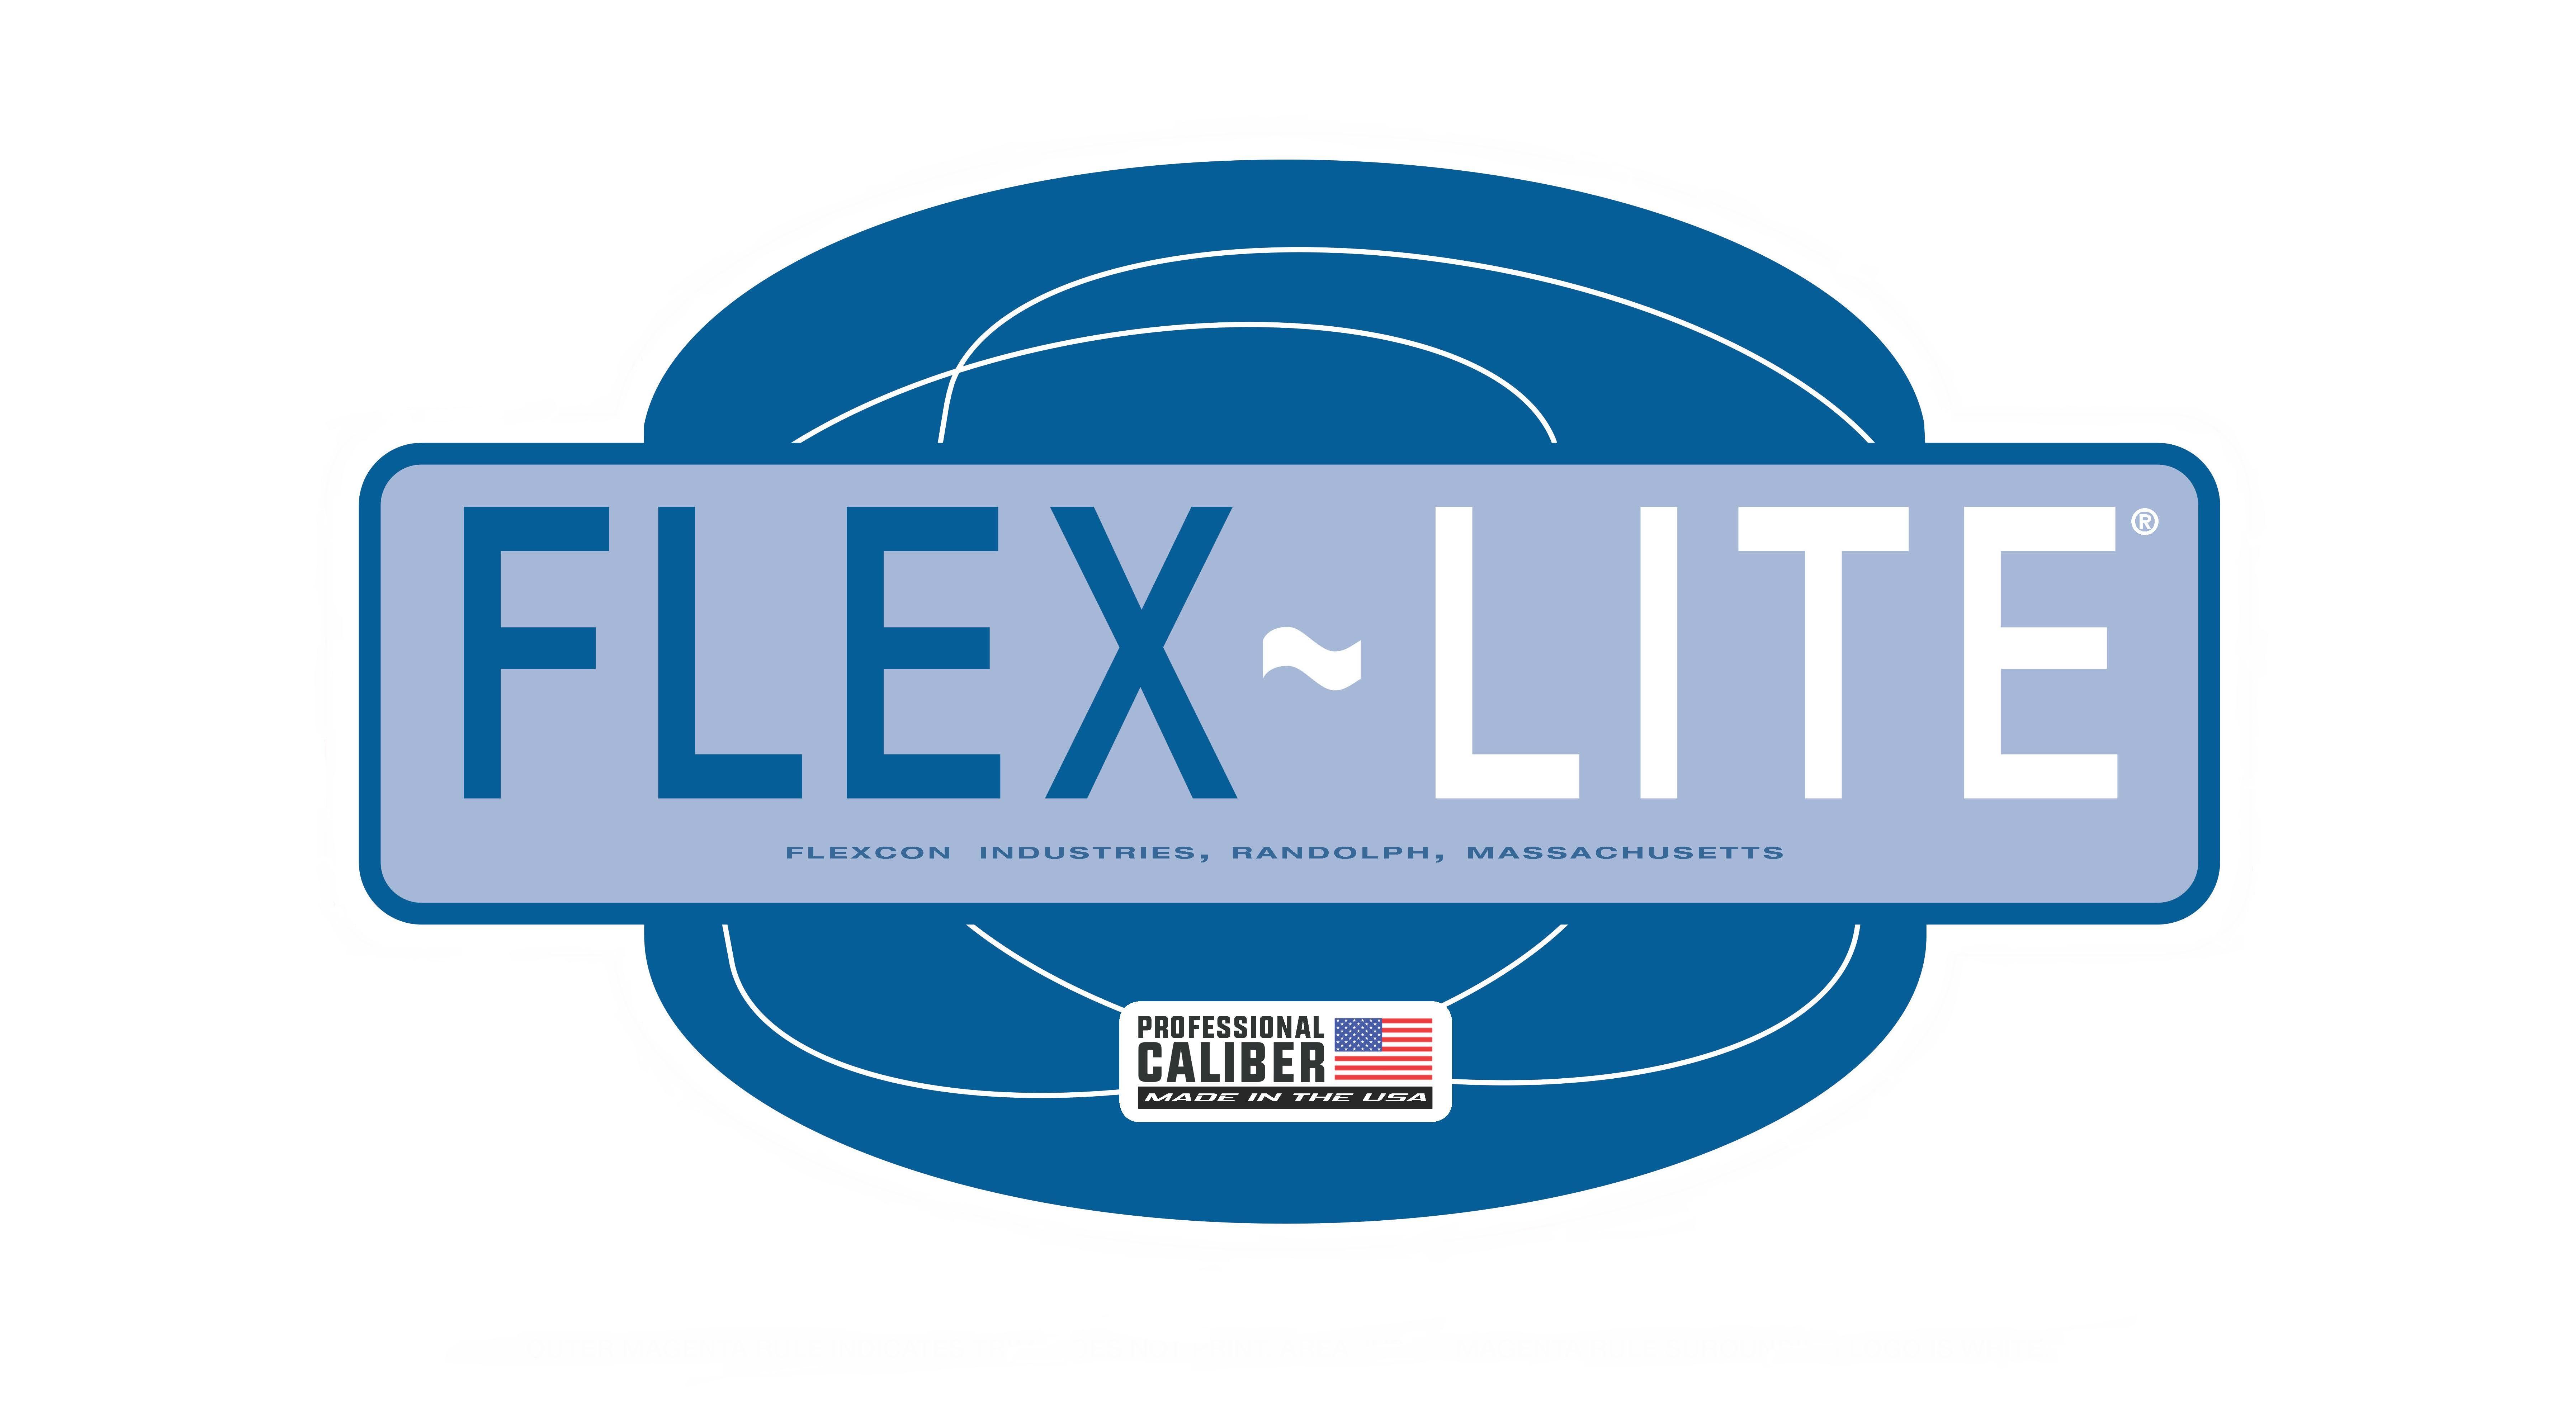 Flexlite